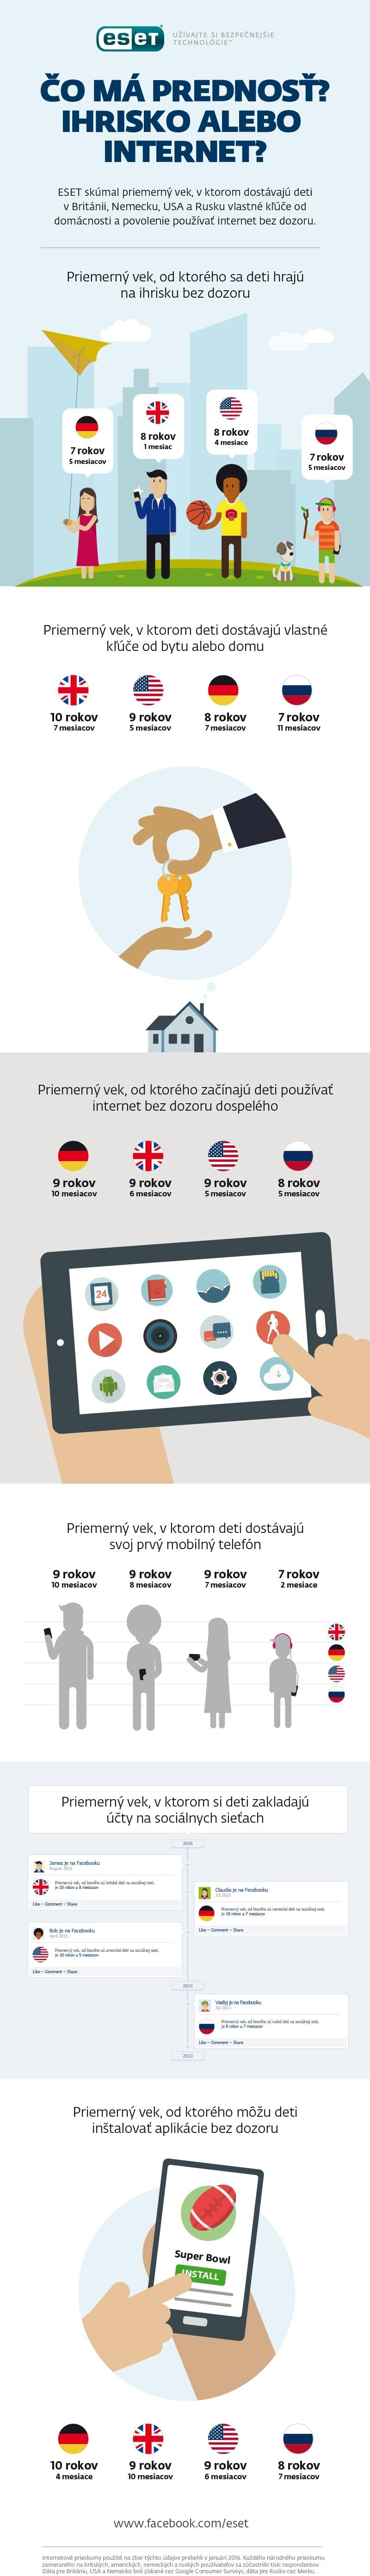 ESET_infografika_DetiAInternet_web2016_3_nowat